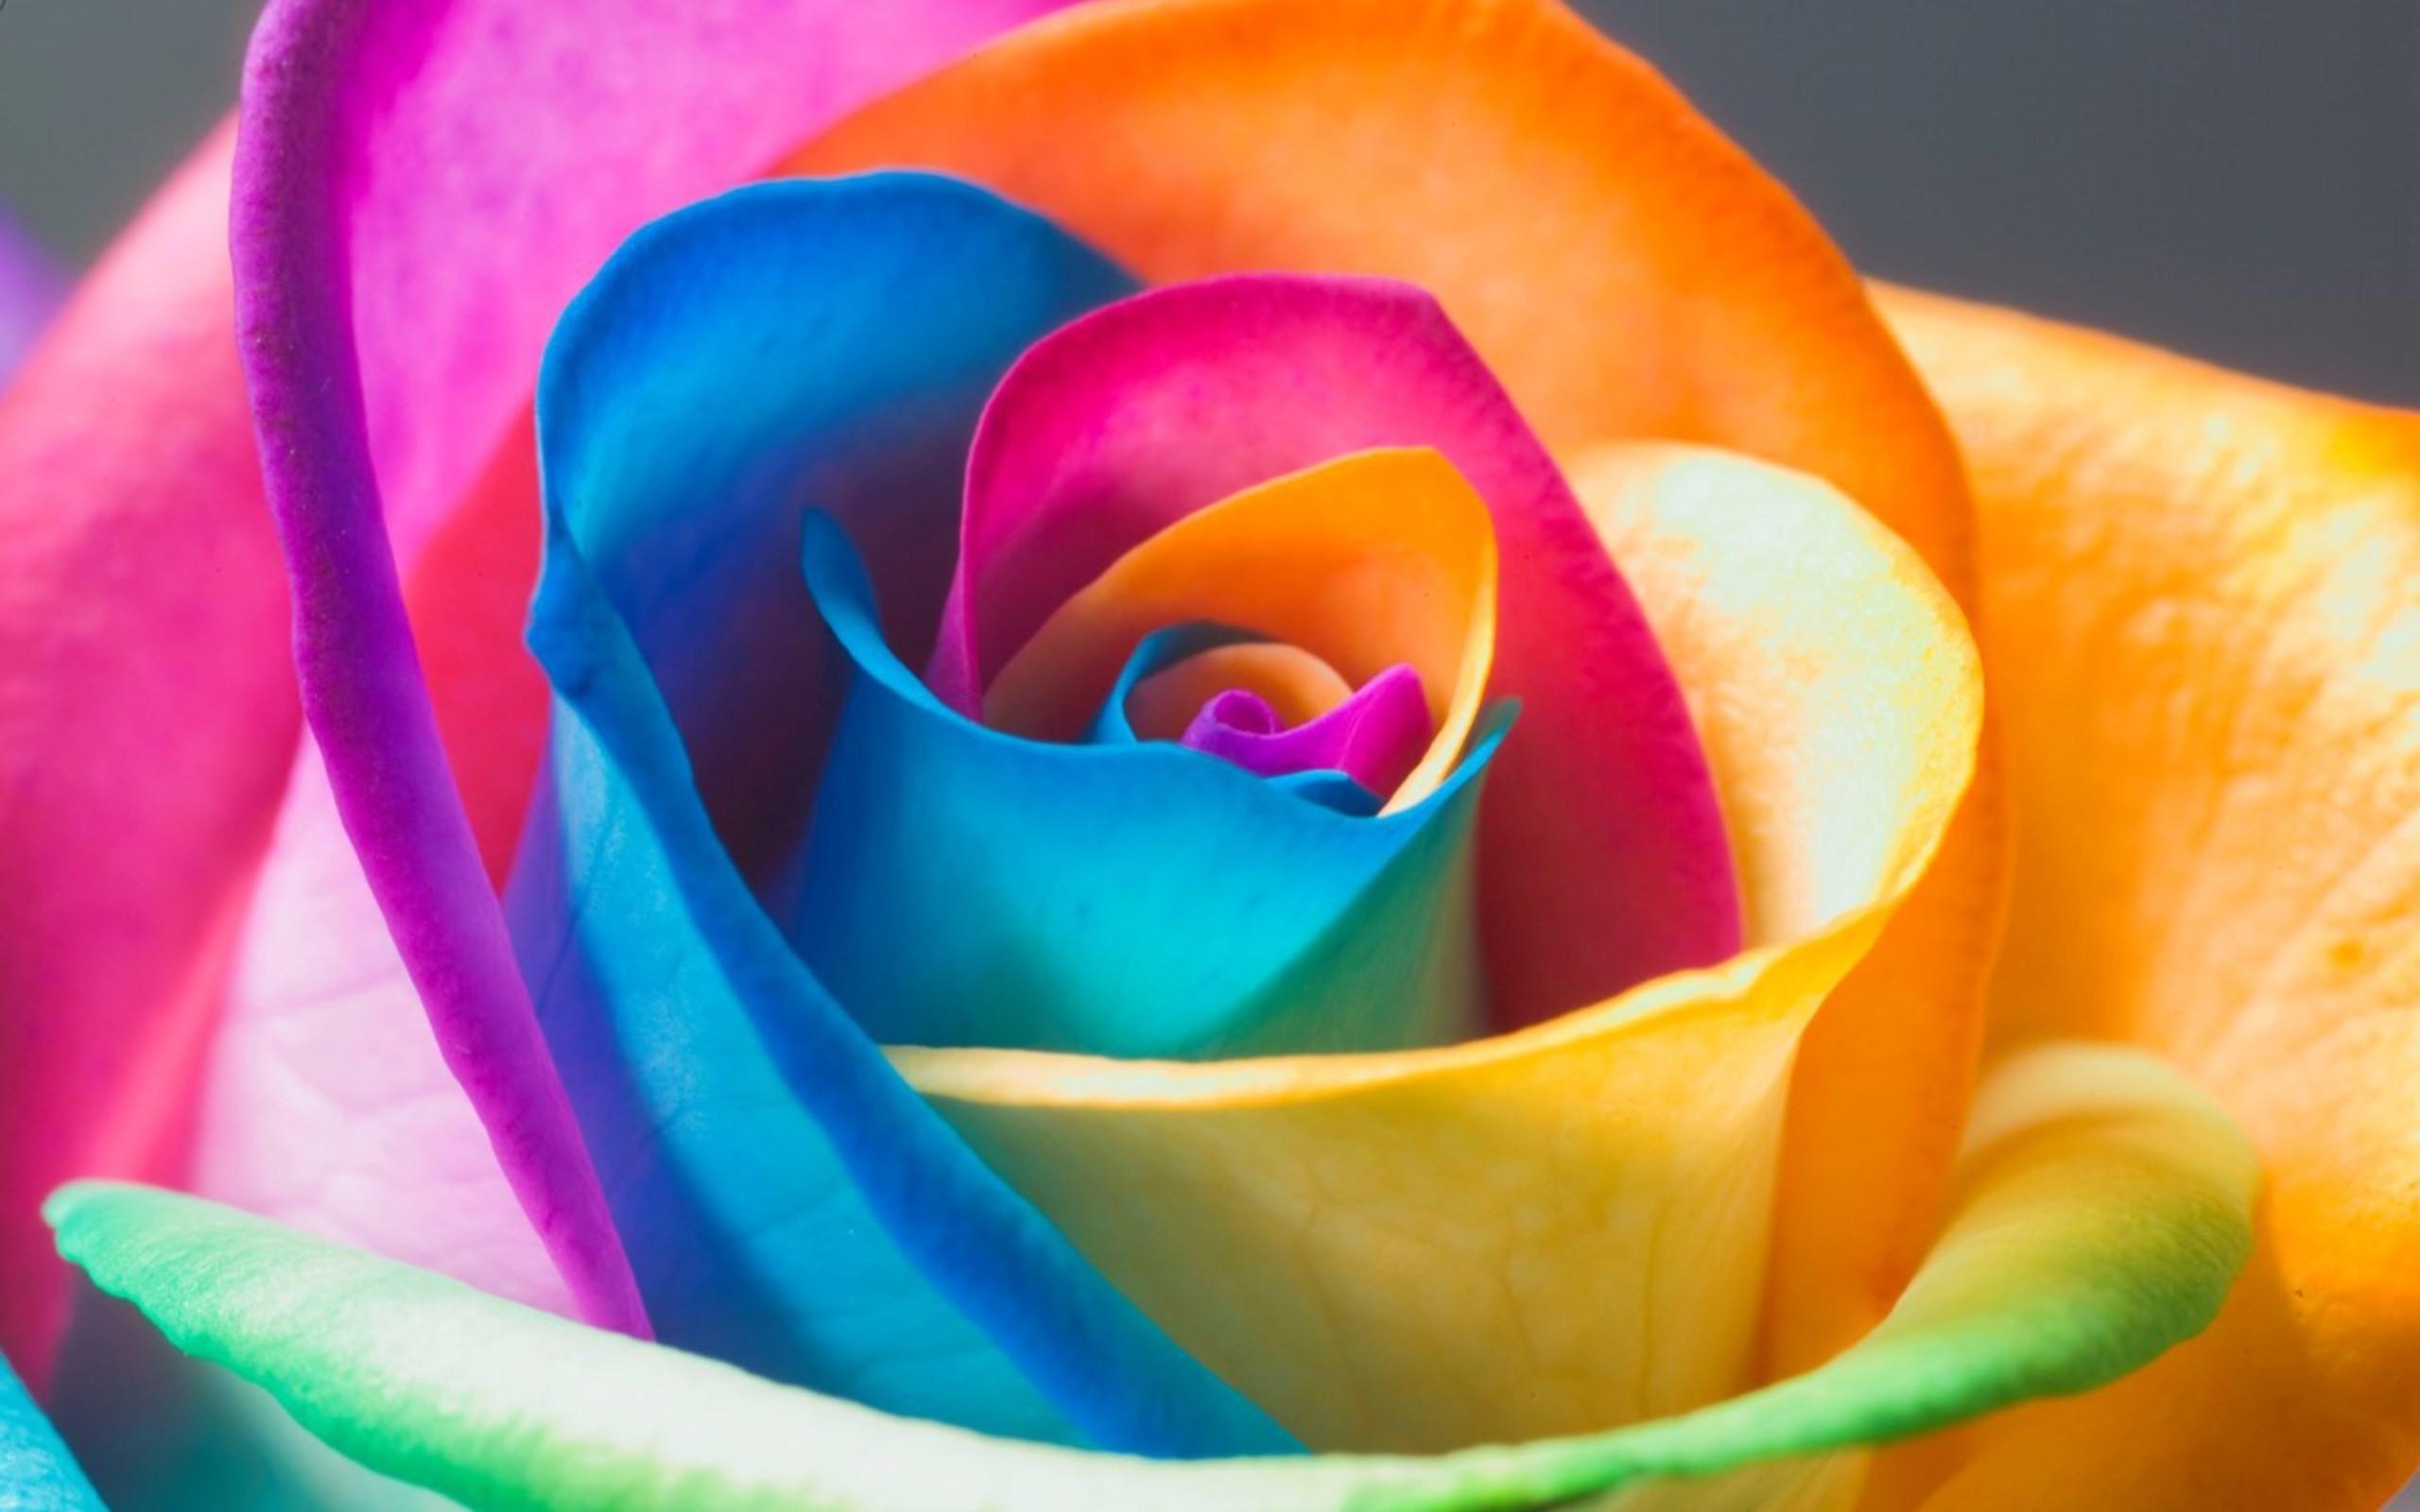 Colorful-Flowers-Rose-Wallpaper